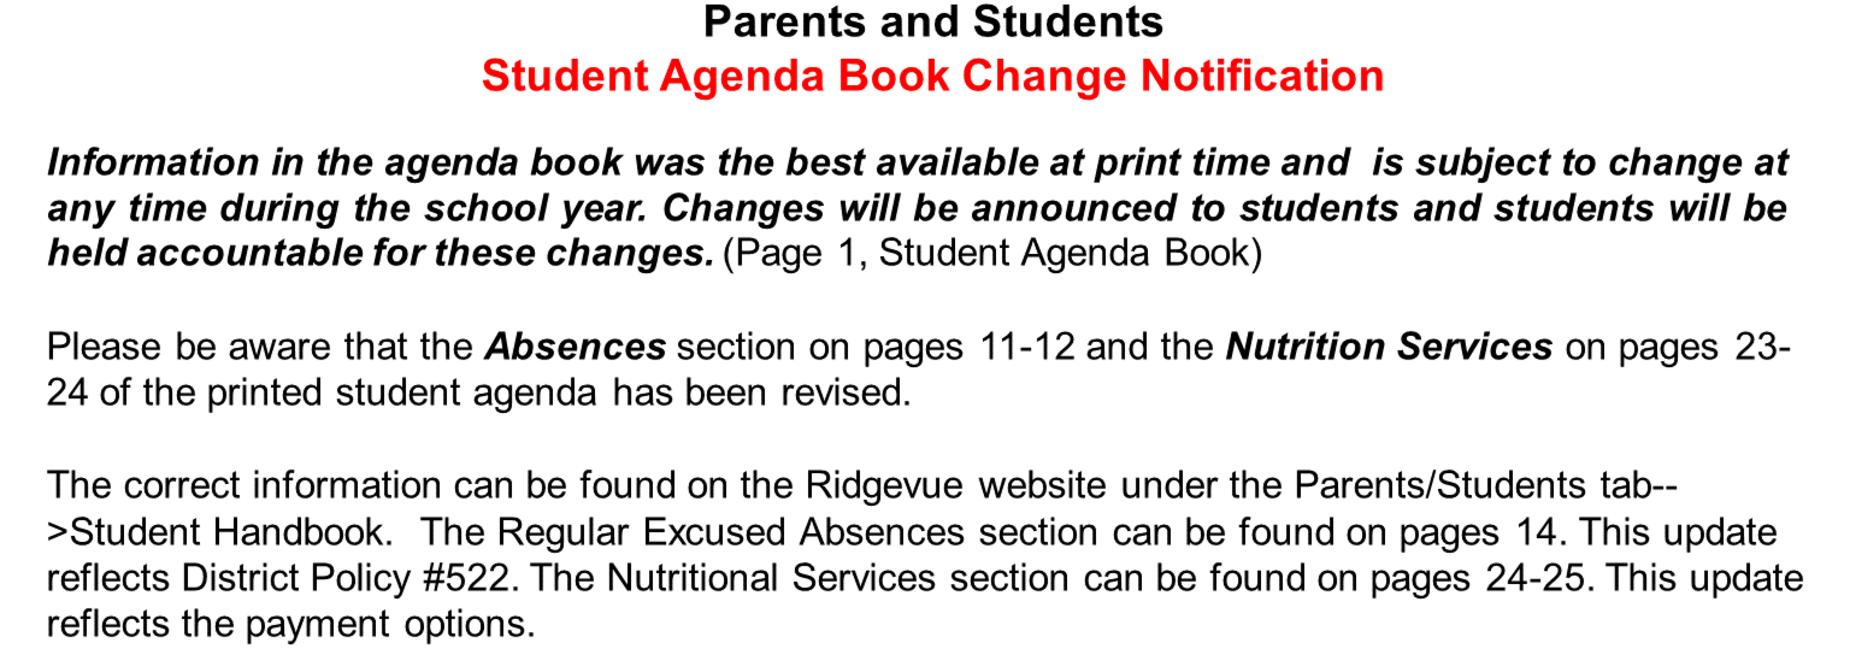 Student Agenda Changes